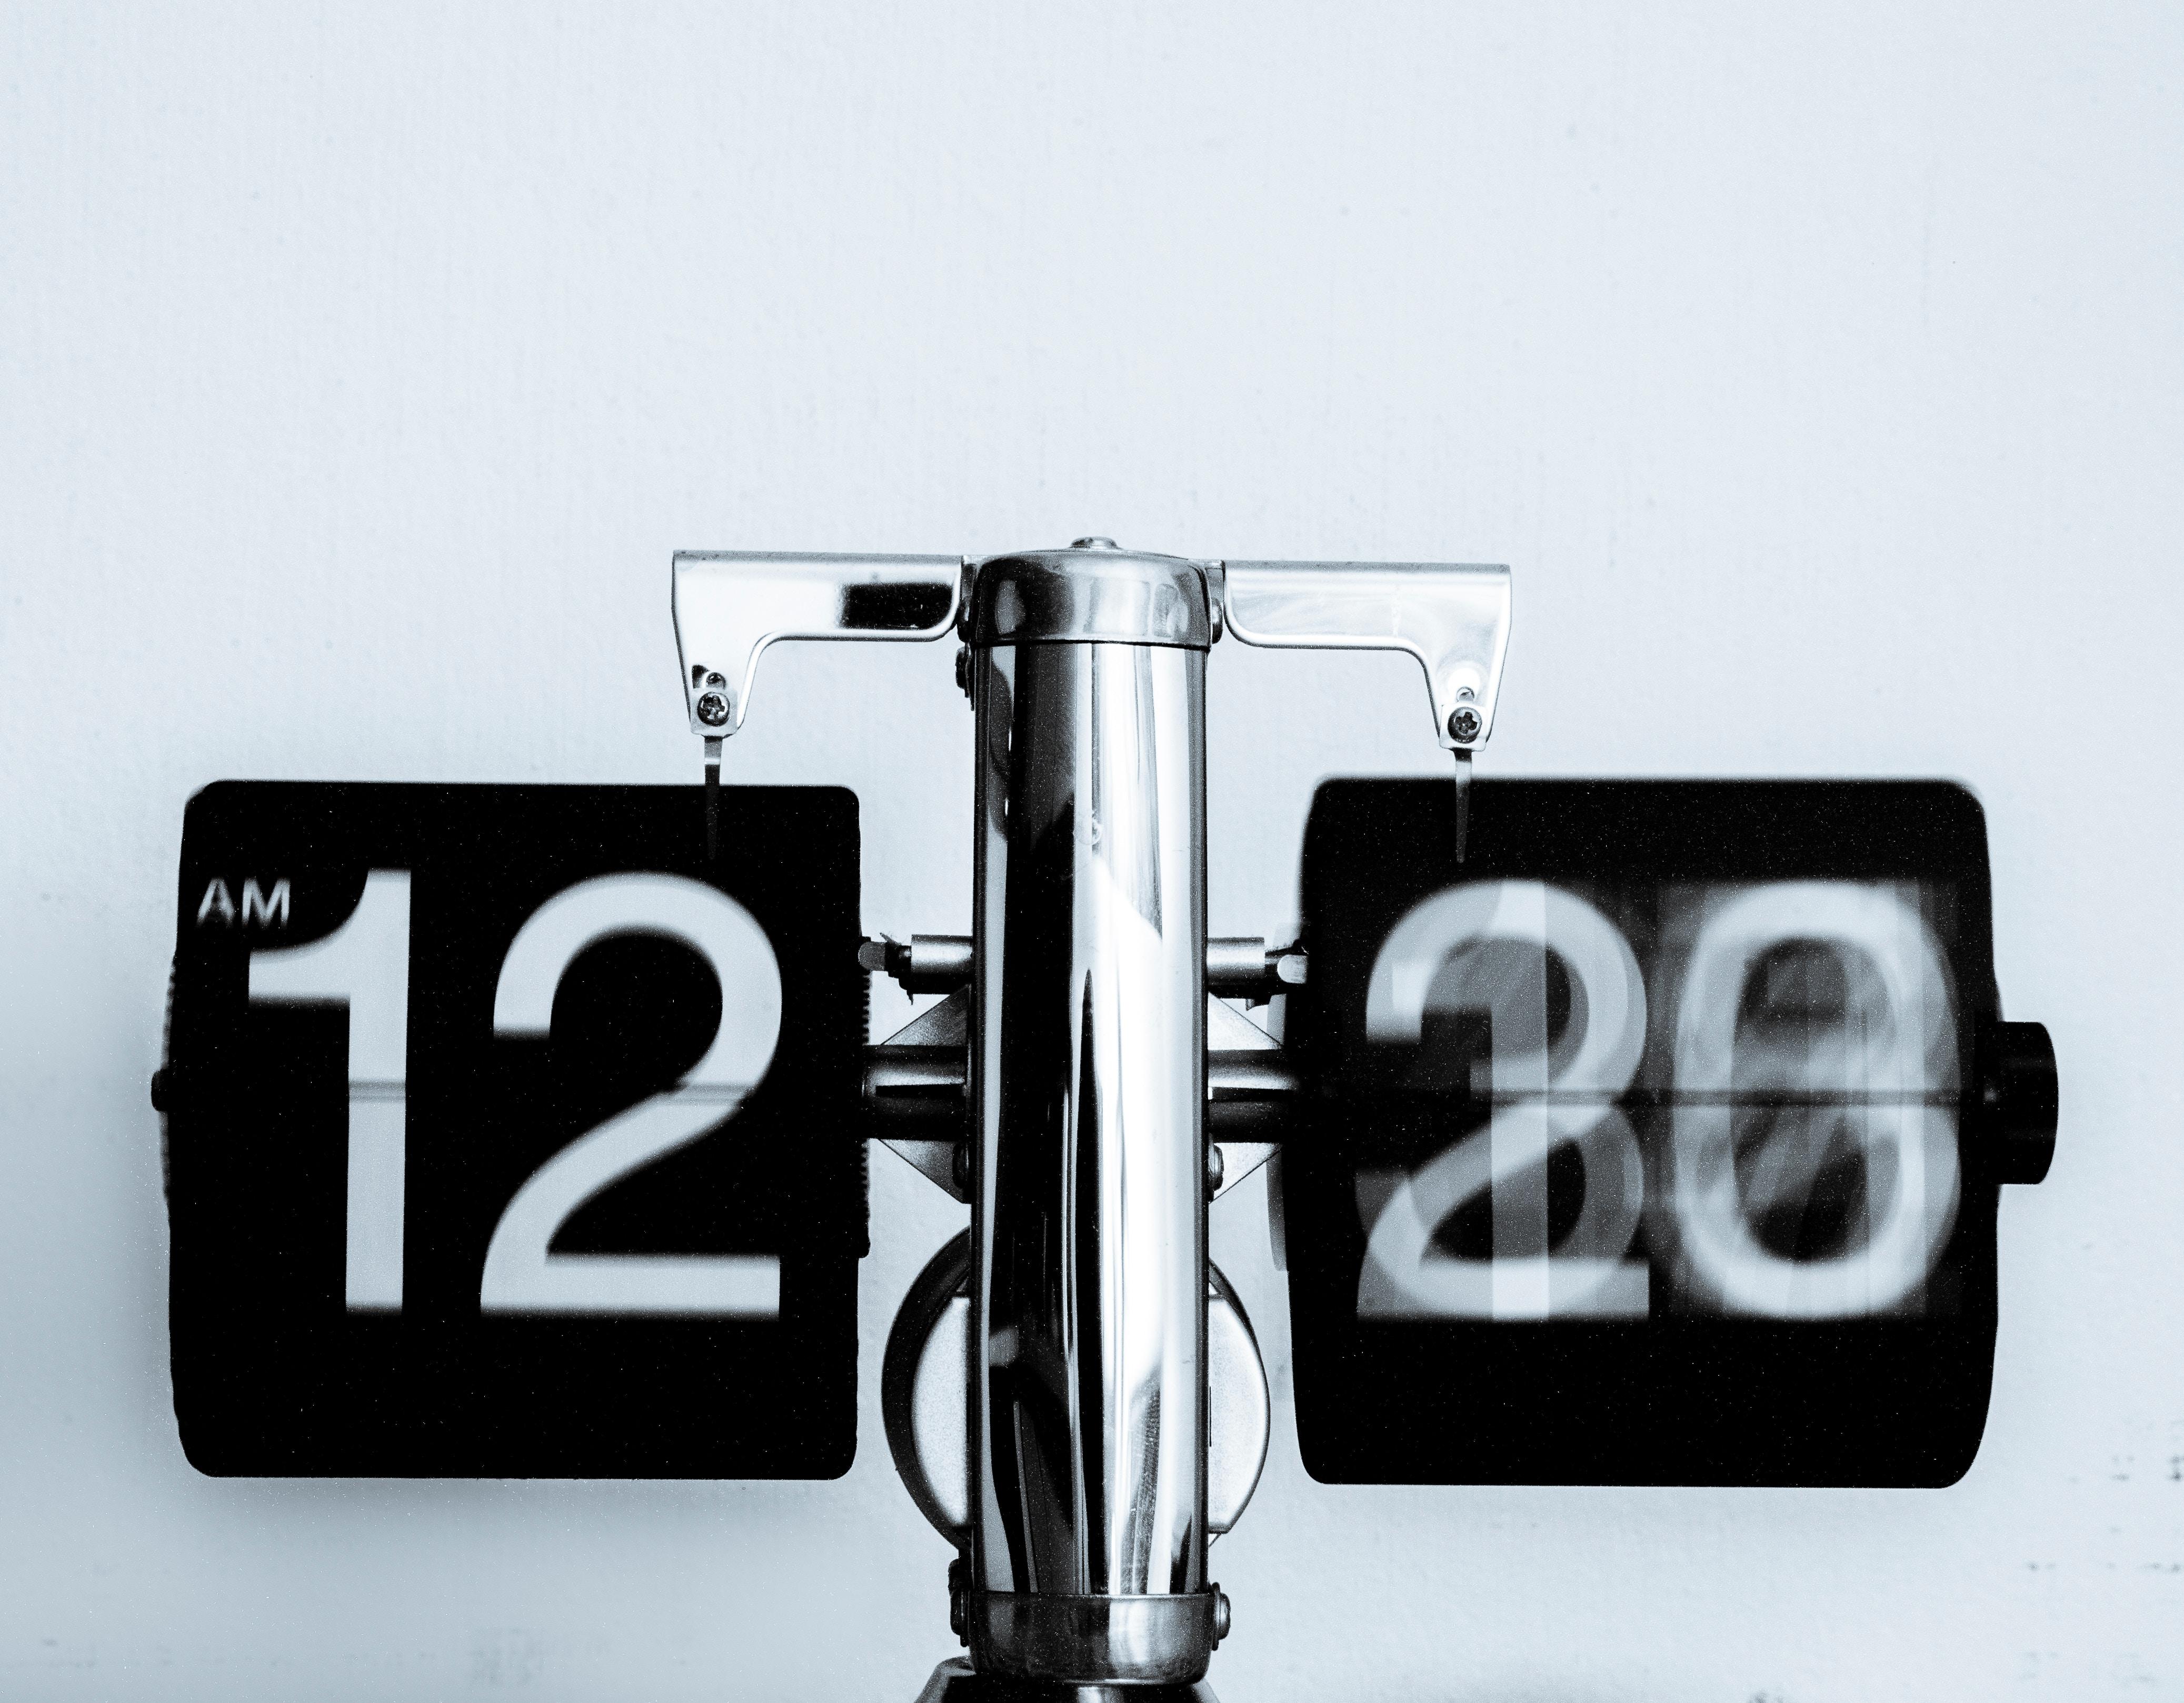 The ESEF countdown has begun